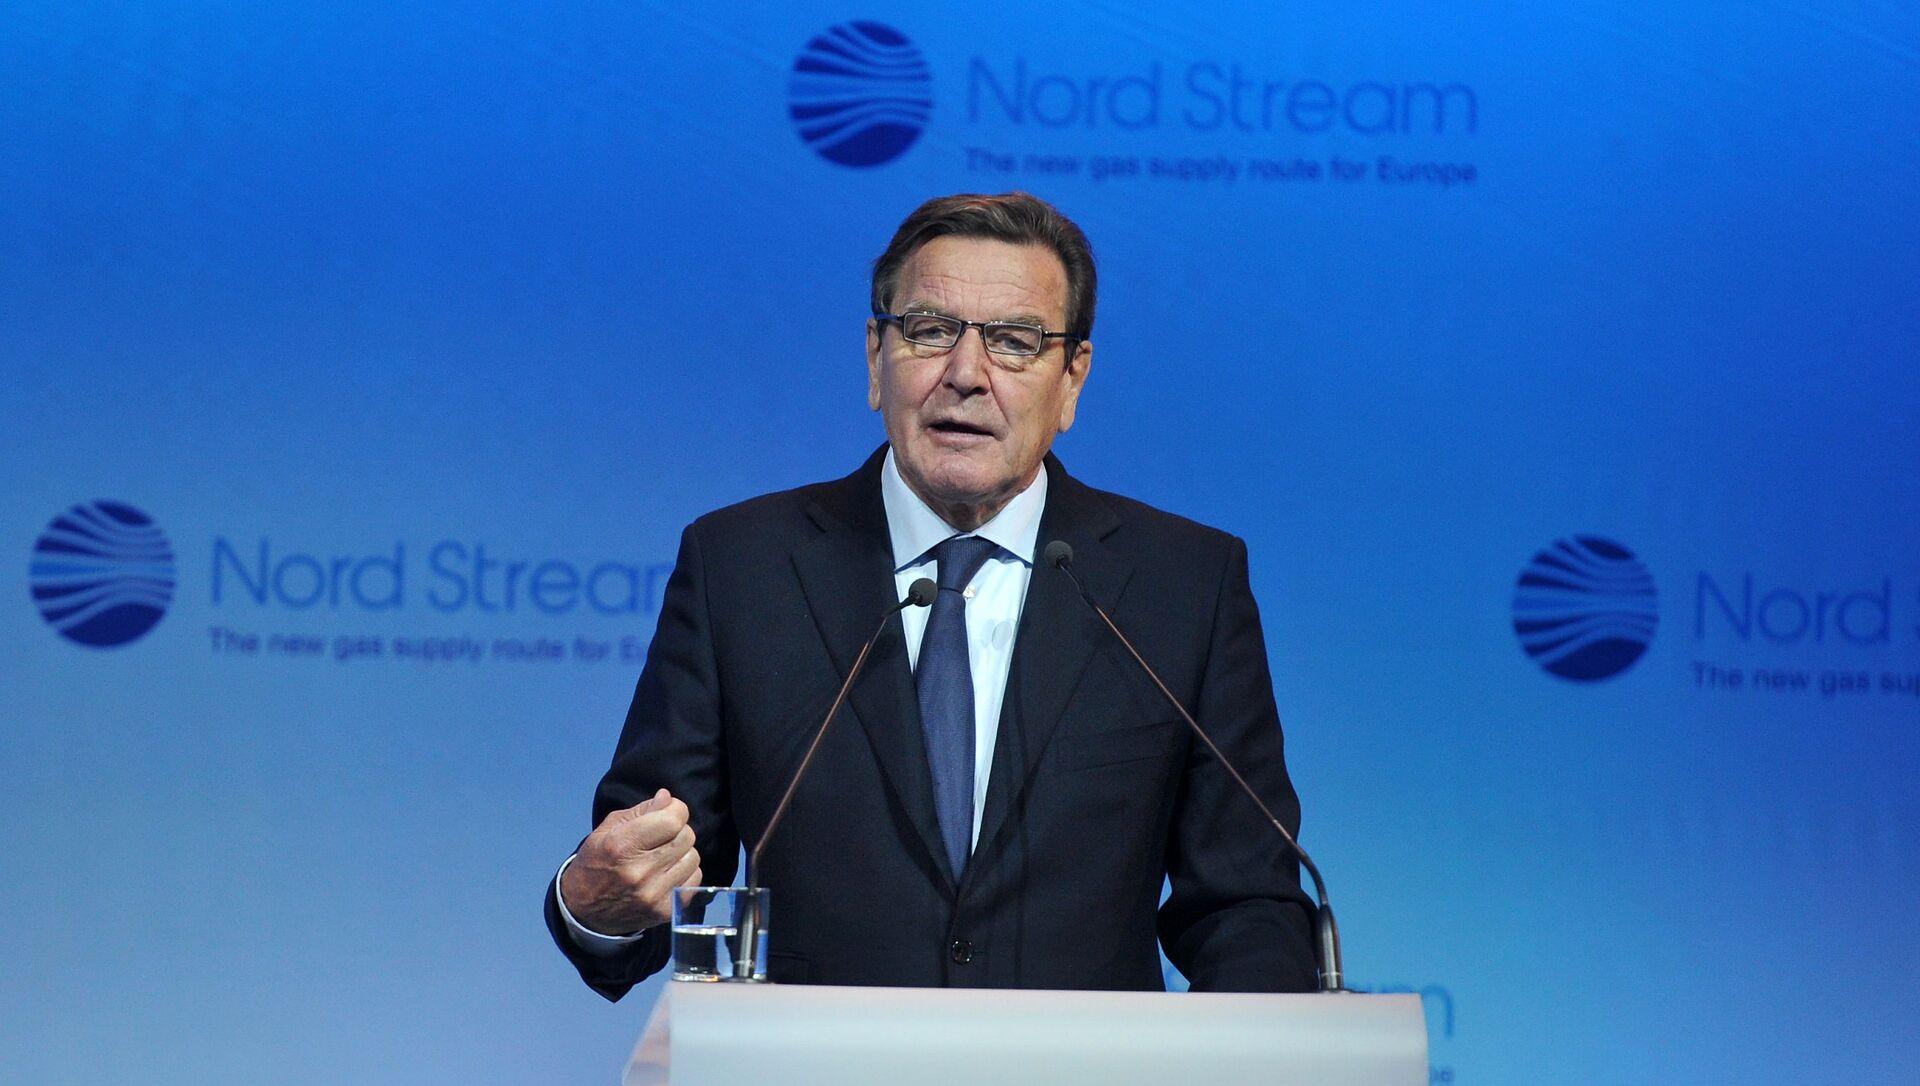 Председатель комитета акционеров Nord Stream AG Герхард Шредер - Sputnik Грузия, 1920, 11.02.2021